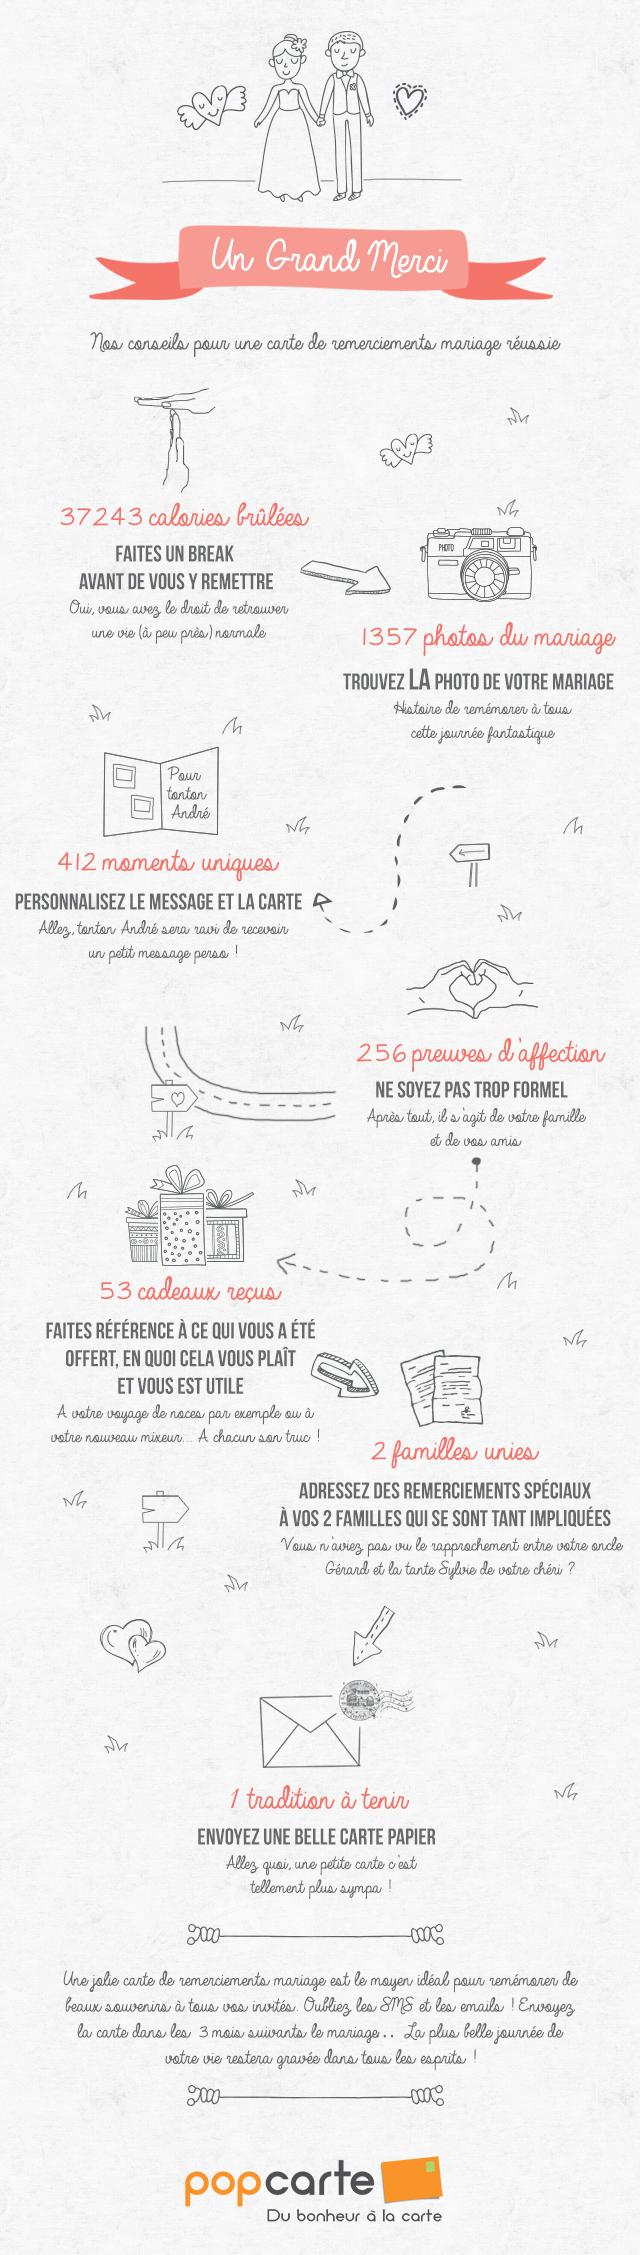 Remerciements mariage [Infographie]